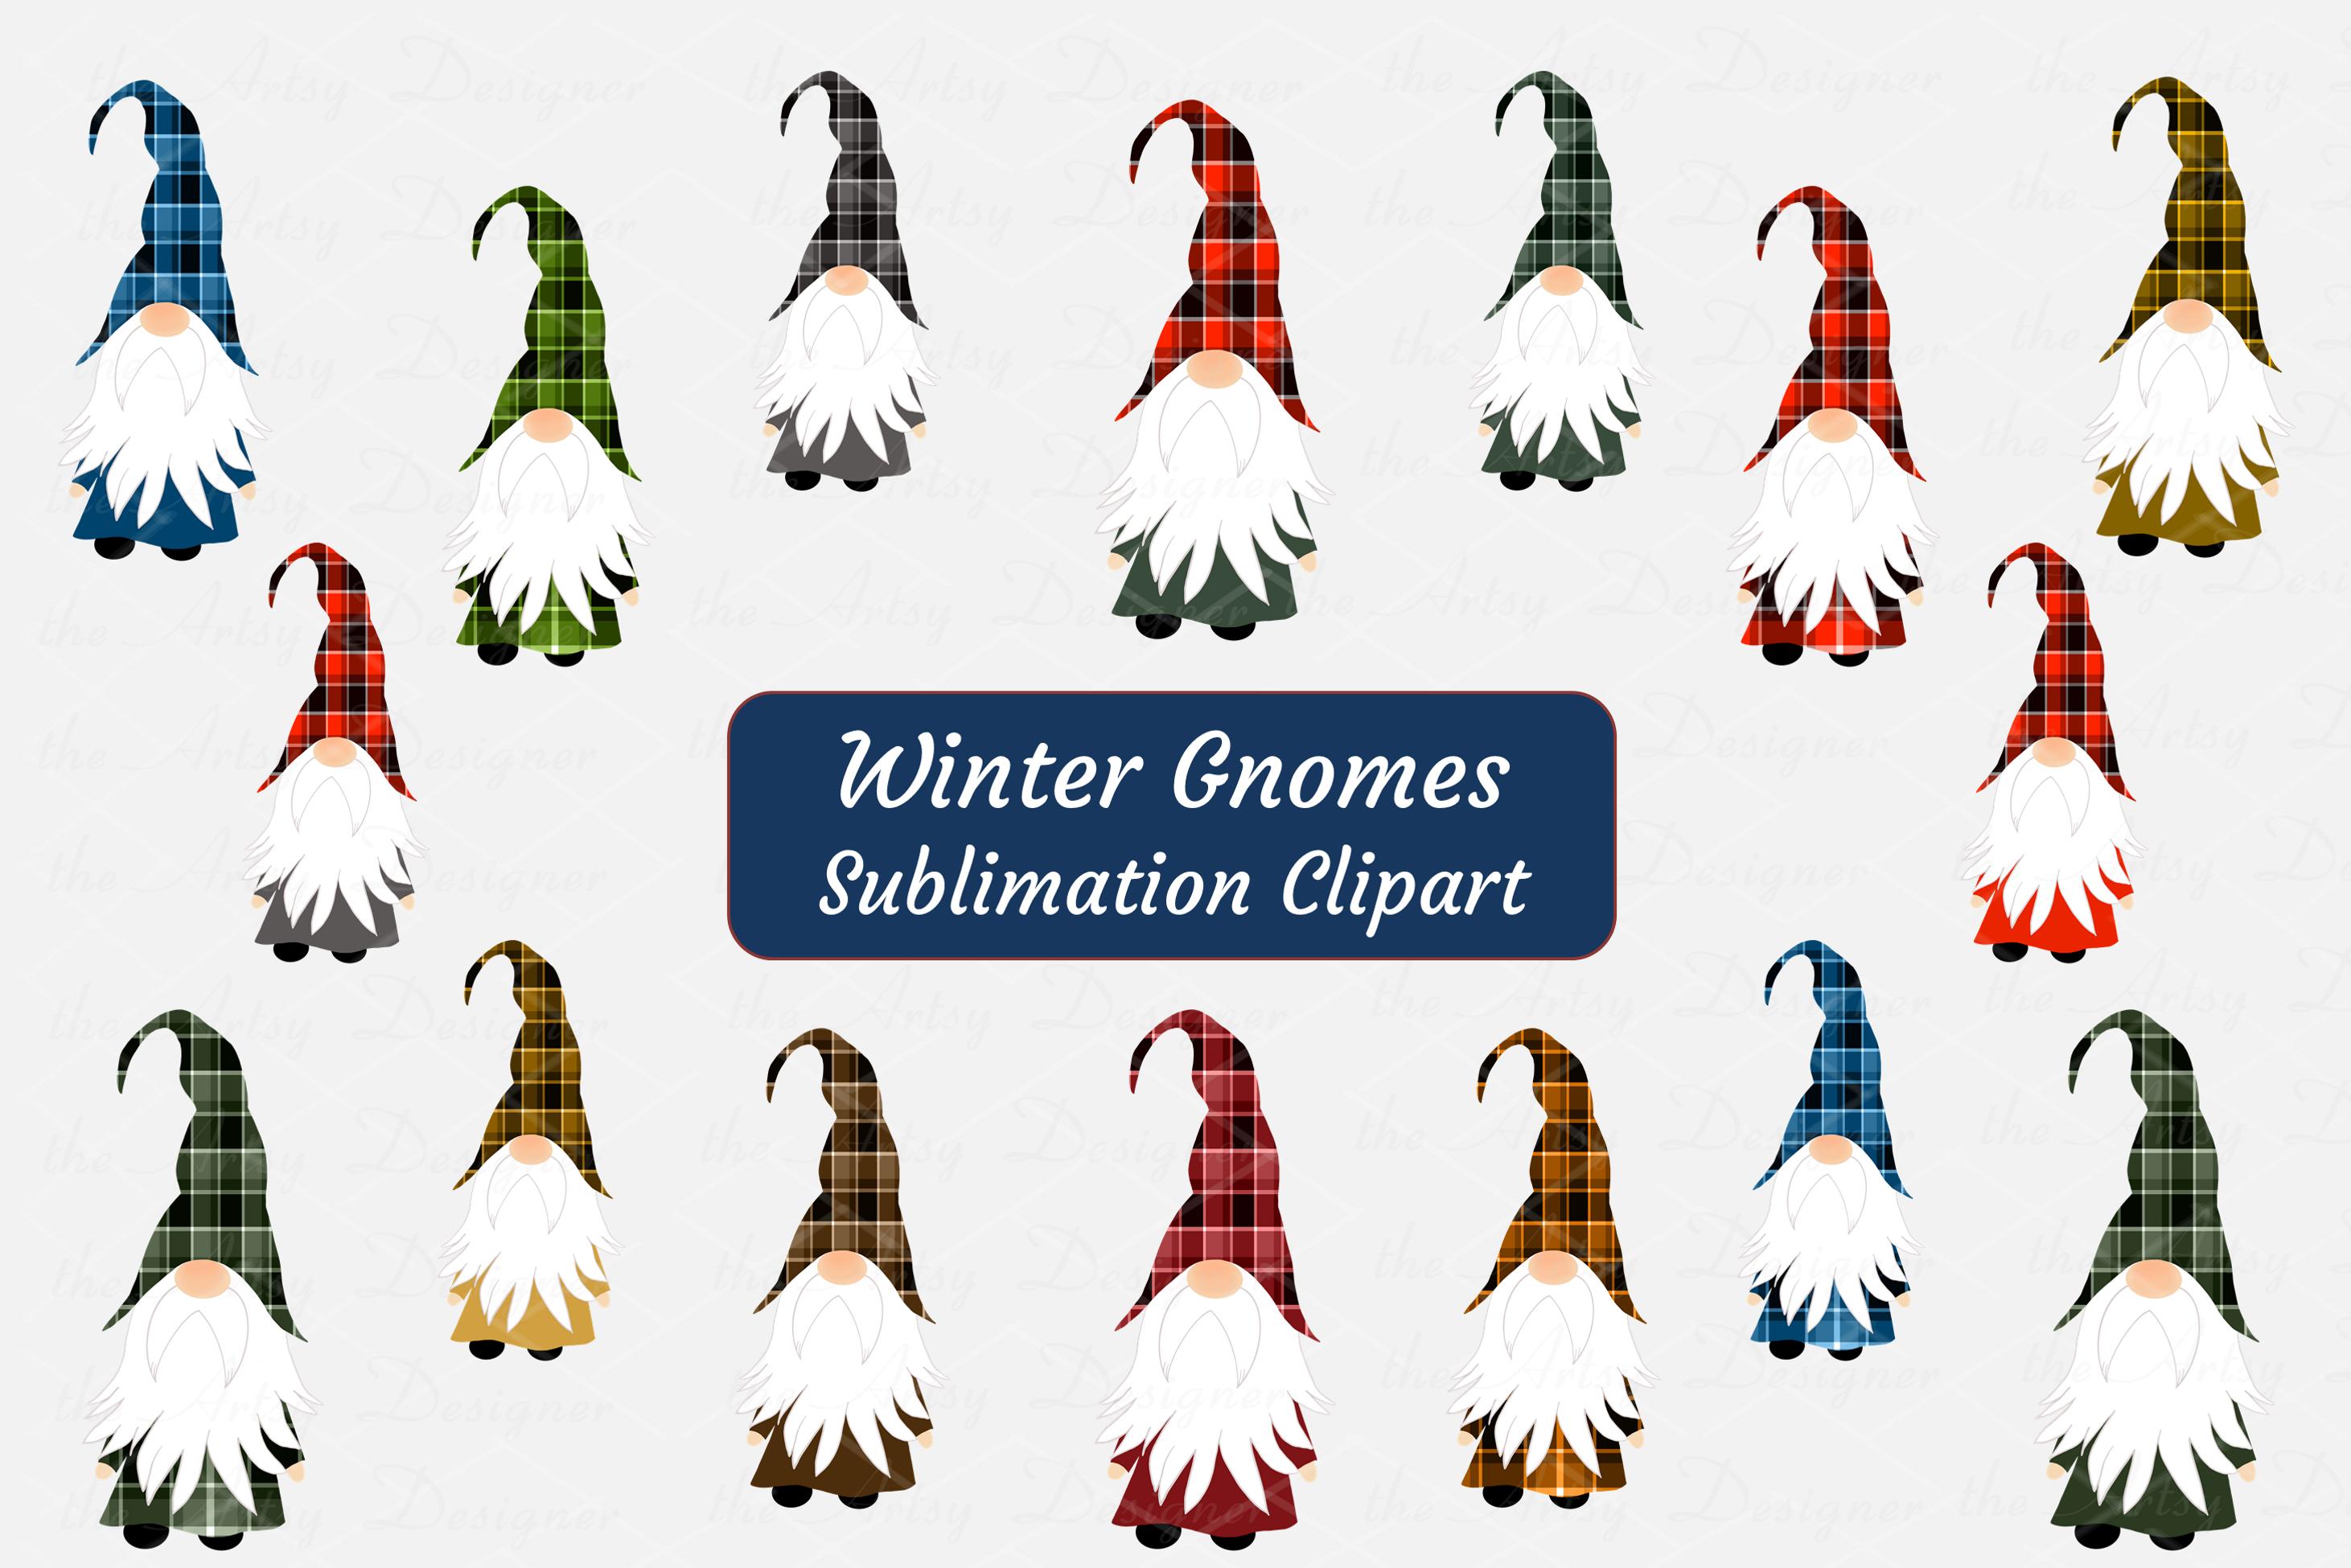 Winter Gnomes Buffalo Plaid Sublimation ClipArt Bundle example image 1